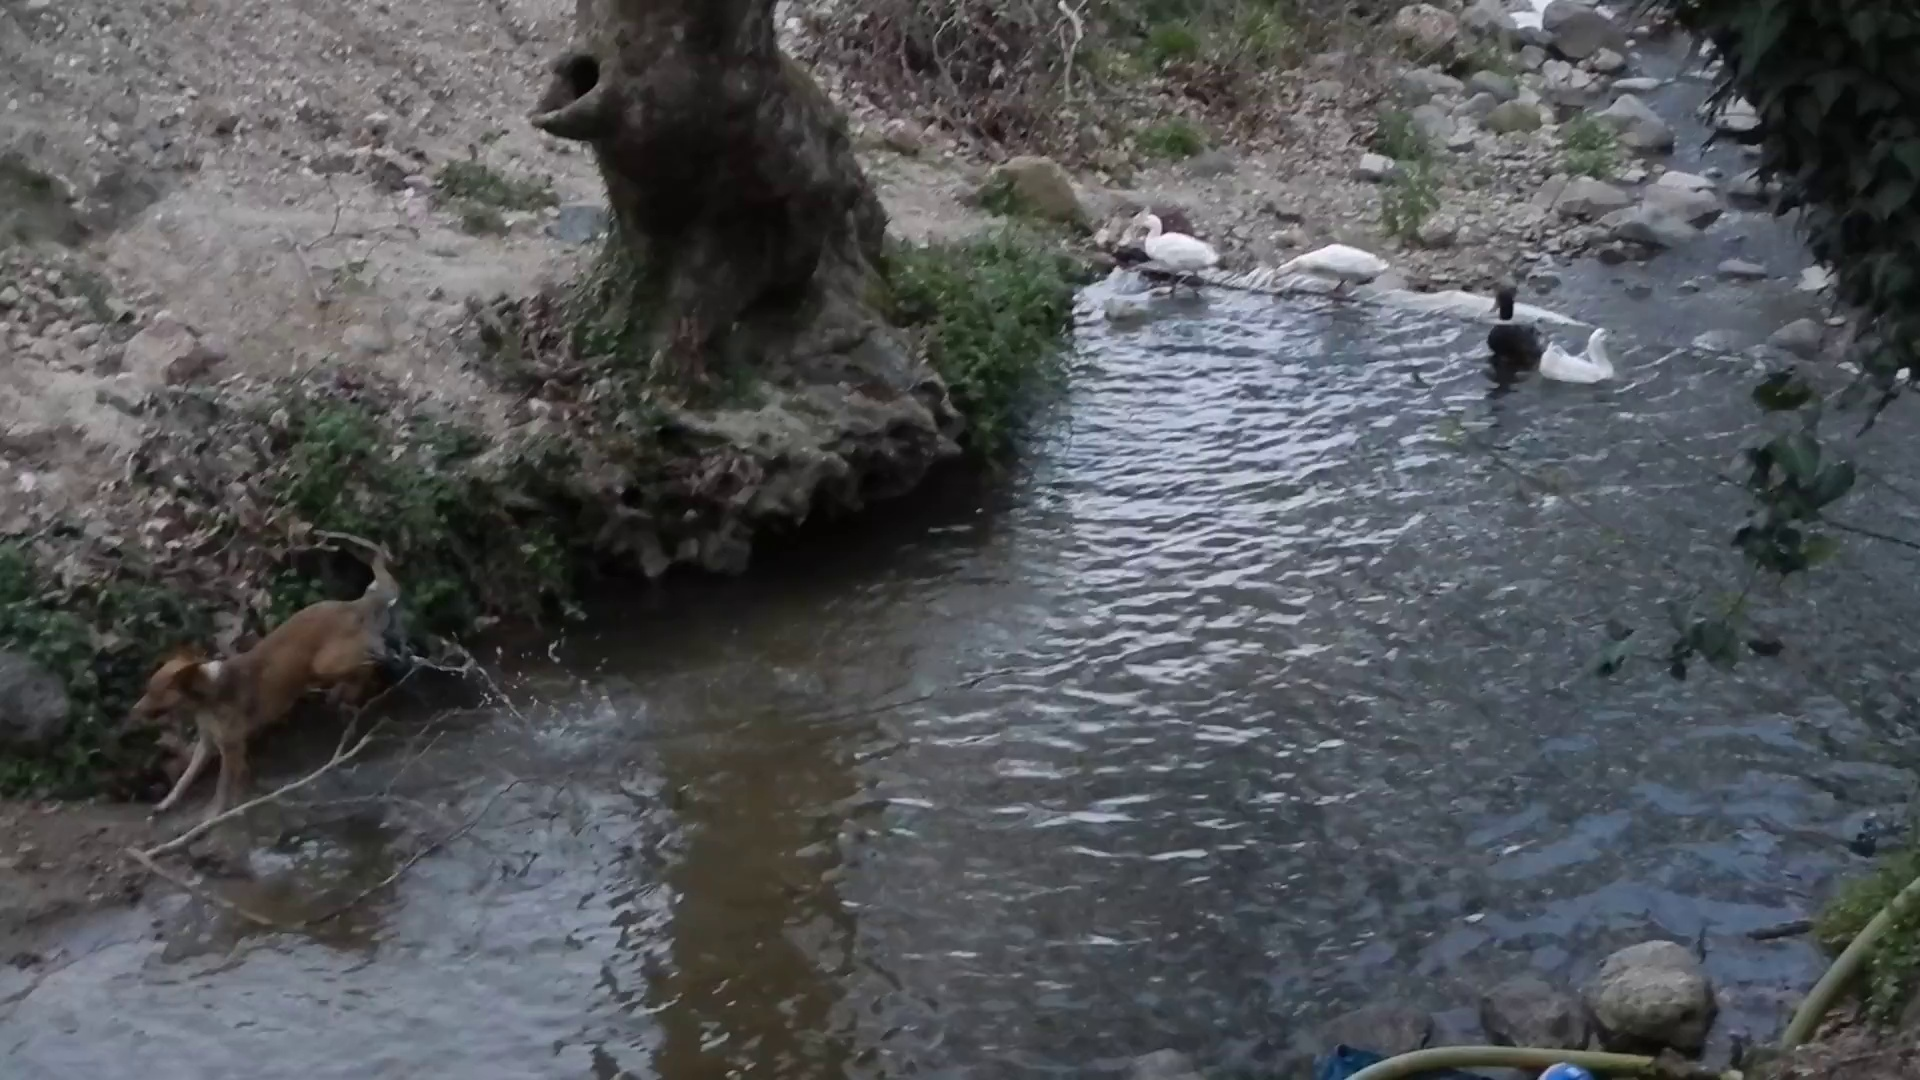 Ducks & Dog Playing